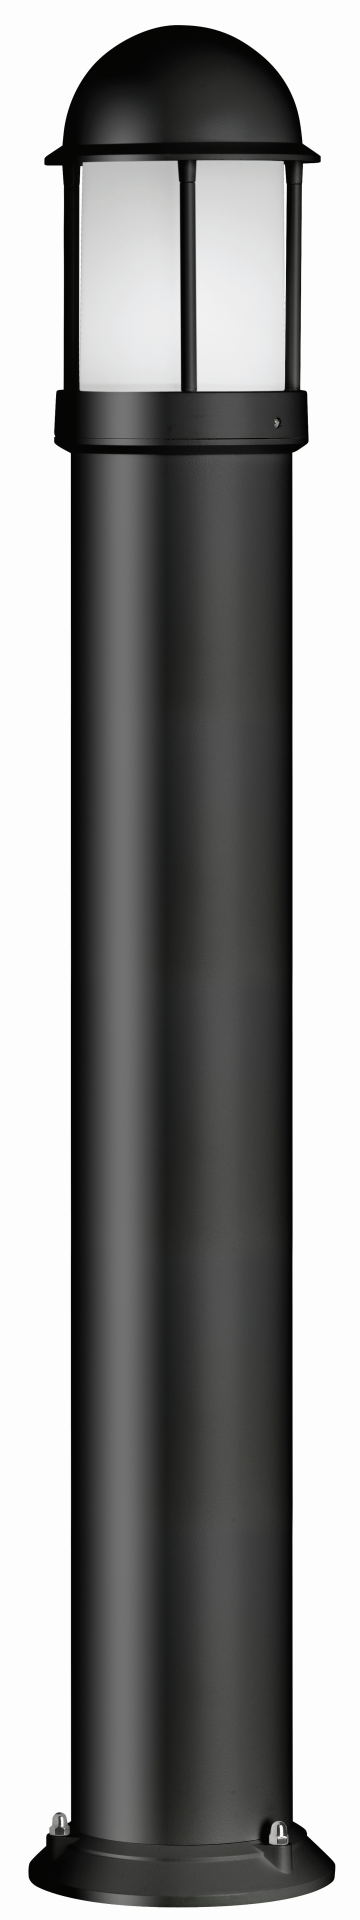 Standleuchte lang Typ 1027